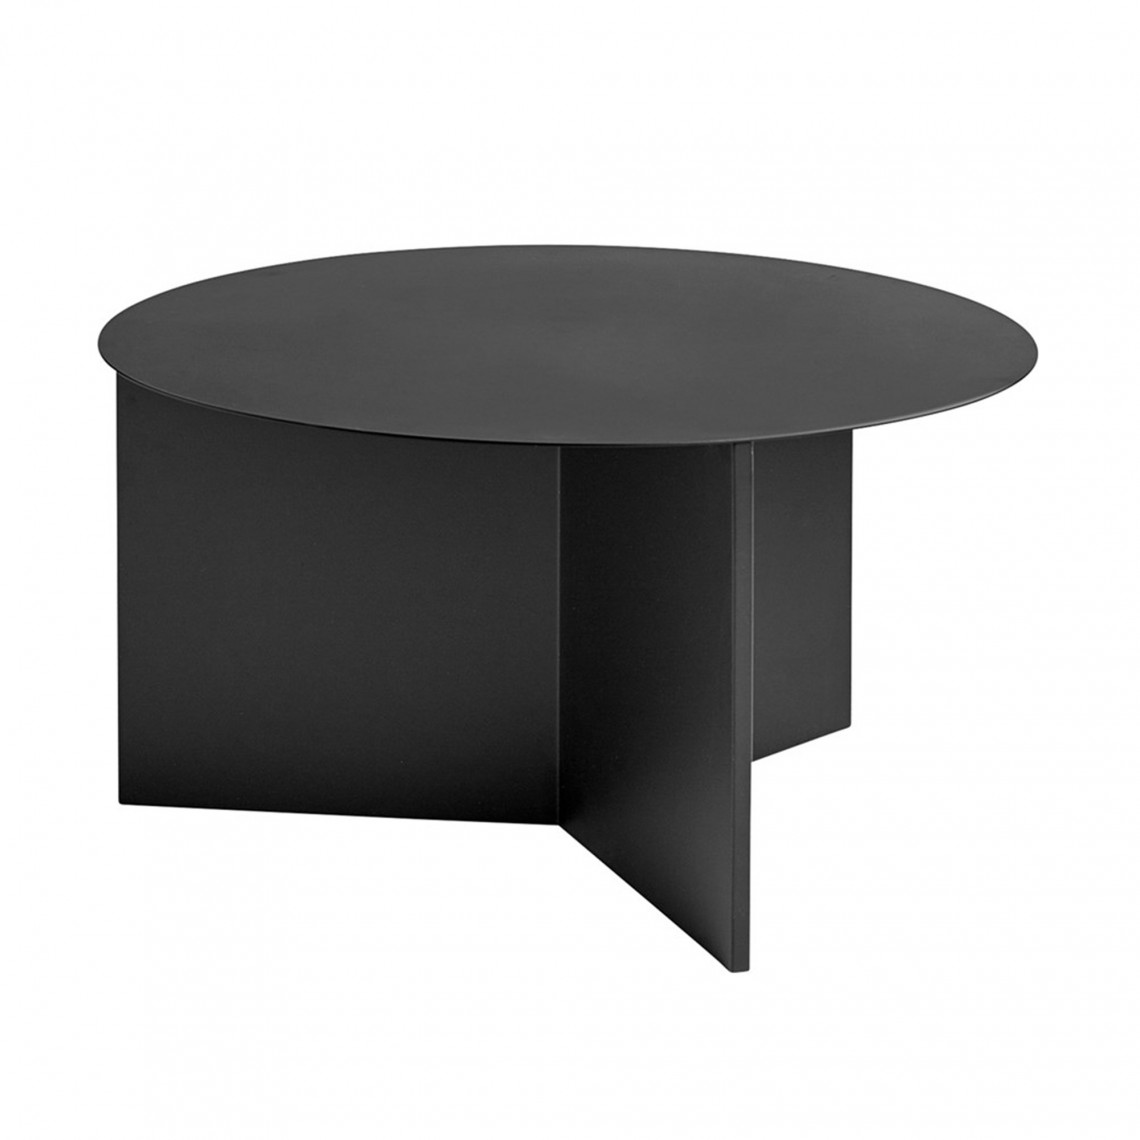 Slit Table Round XL